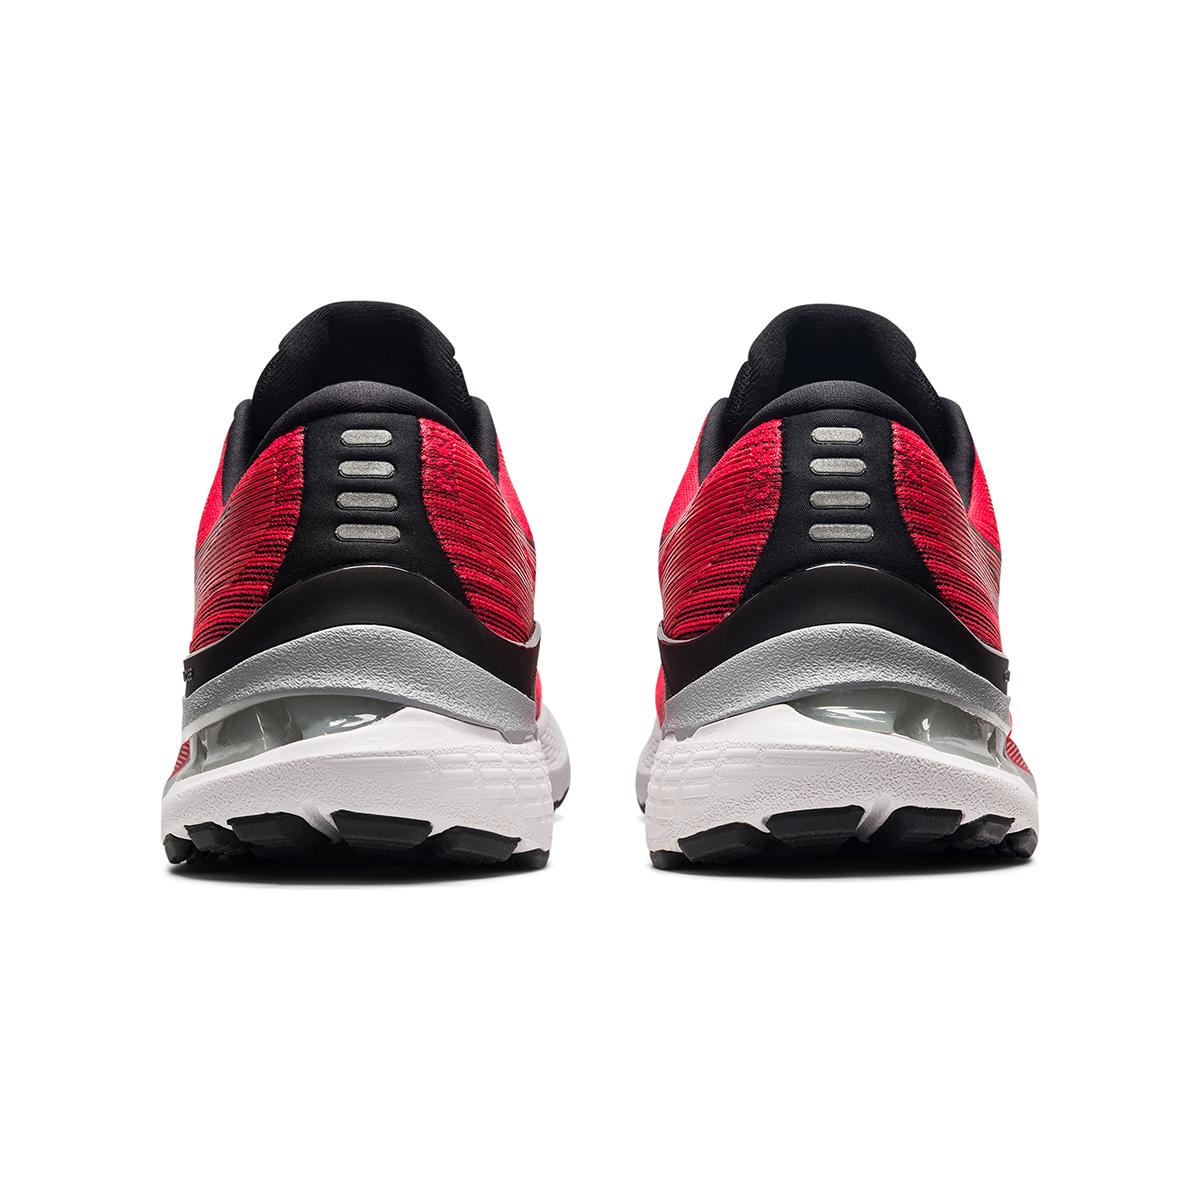 Men's Asics Gel-Kayano 28 Running Shoe - Color: Electric Red - Size: 7 - Width: Regular, Electric Red, large, image 7